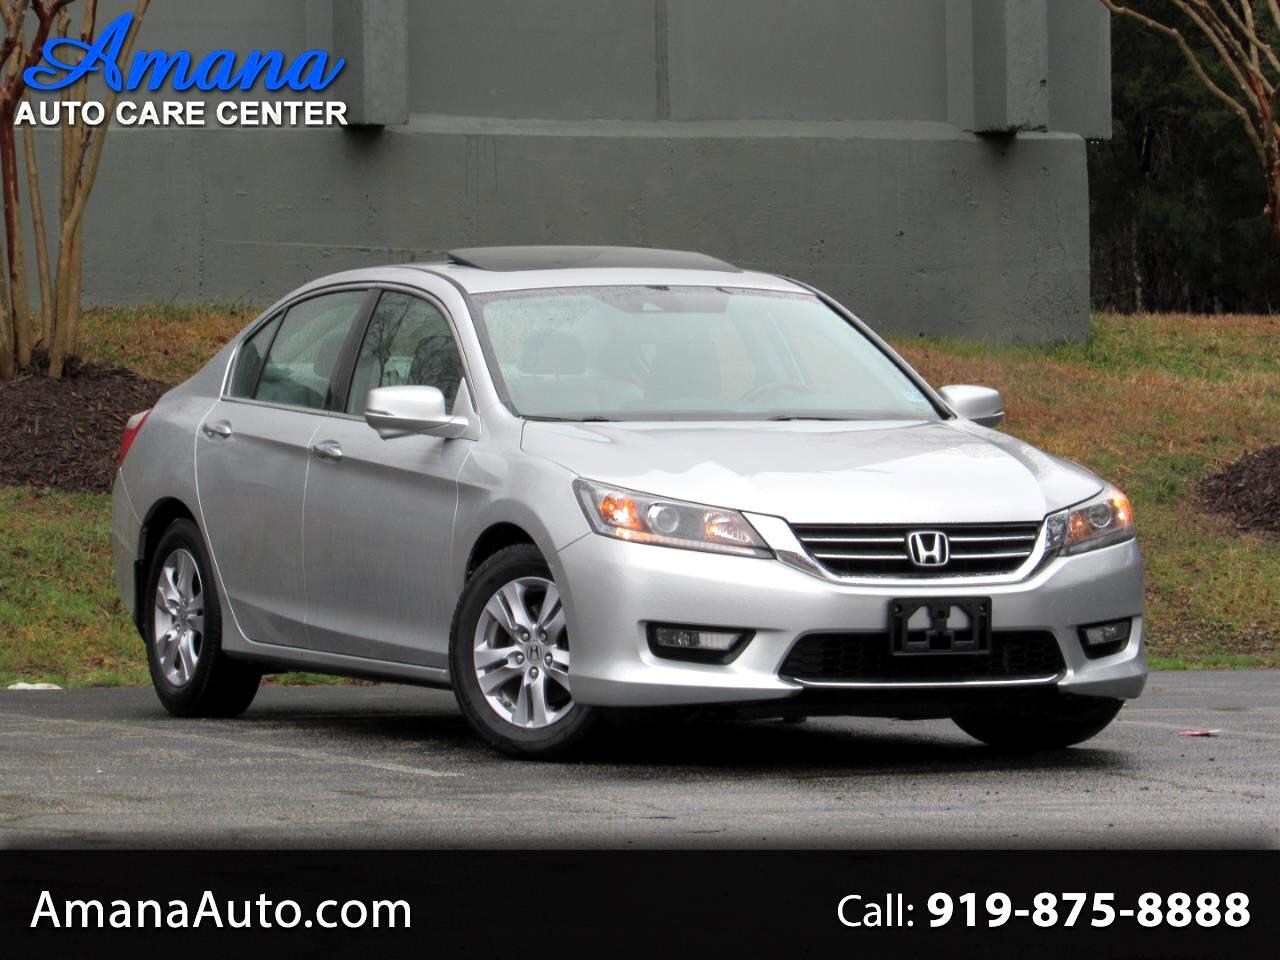 Honda Accord Sedan 4dr I4 CVT EX-L 2014